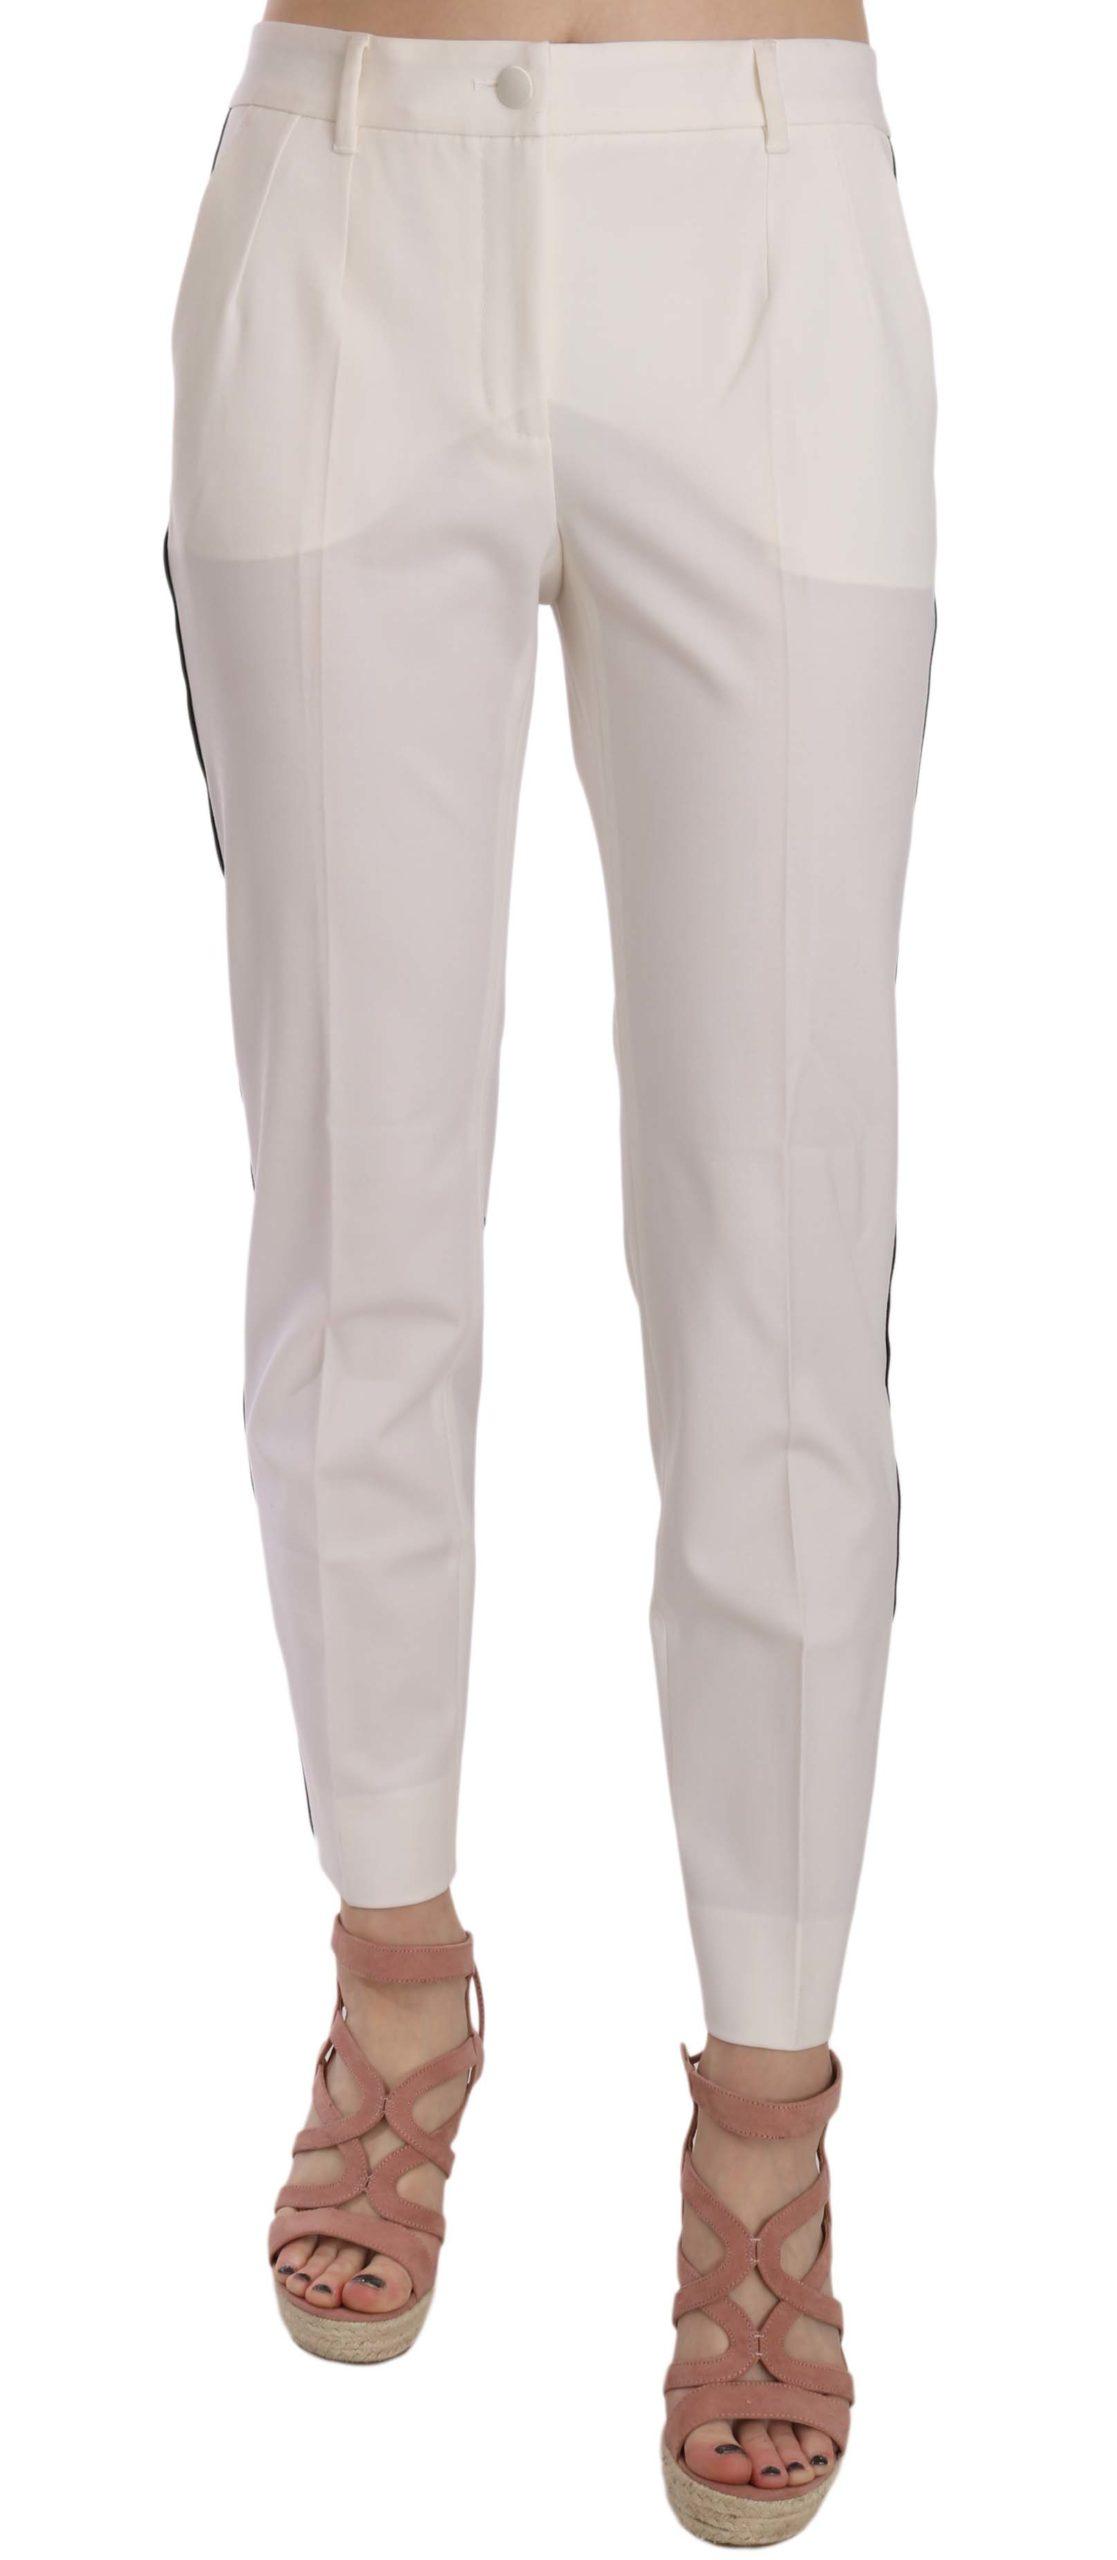 Dolce & Gabbana Women's Side Stripe Wool Tapered Trouser White PAN70013 - IT42|M